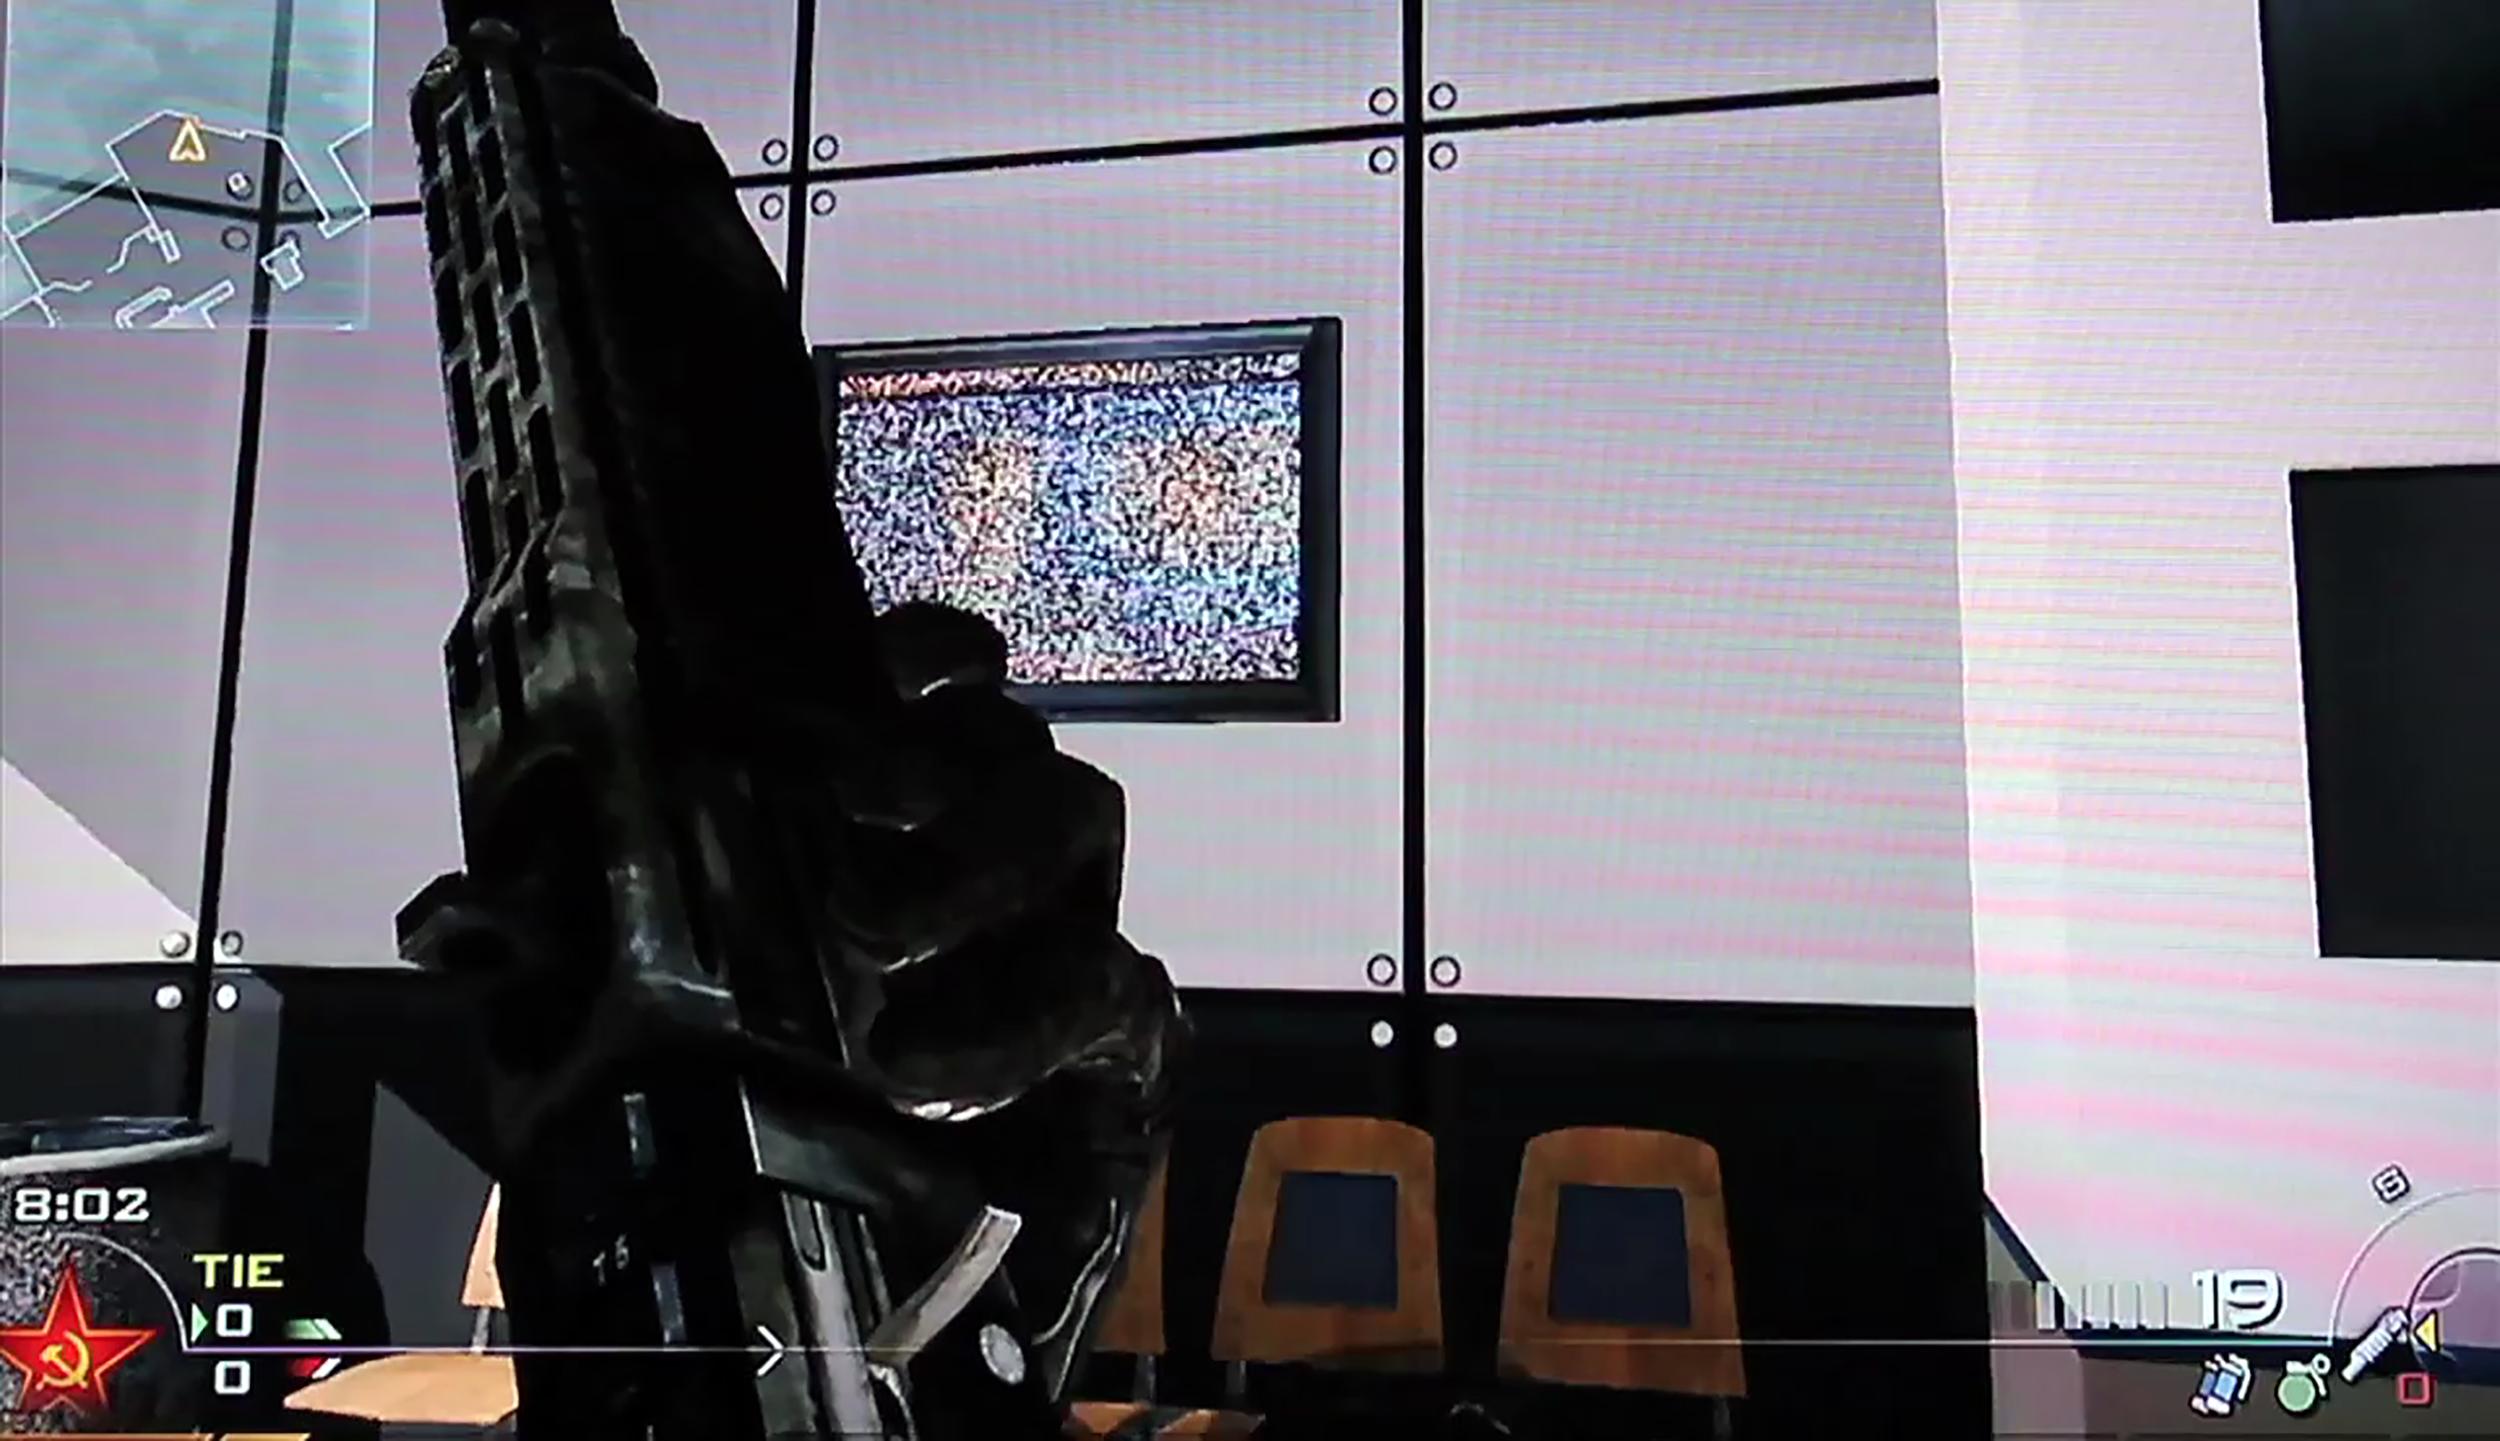 Claire L. Evans, Modern Warfare, 2010, still frame from video installation